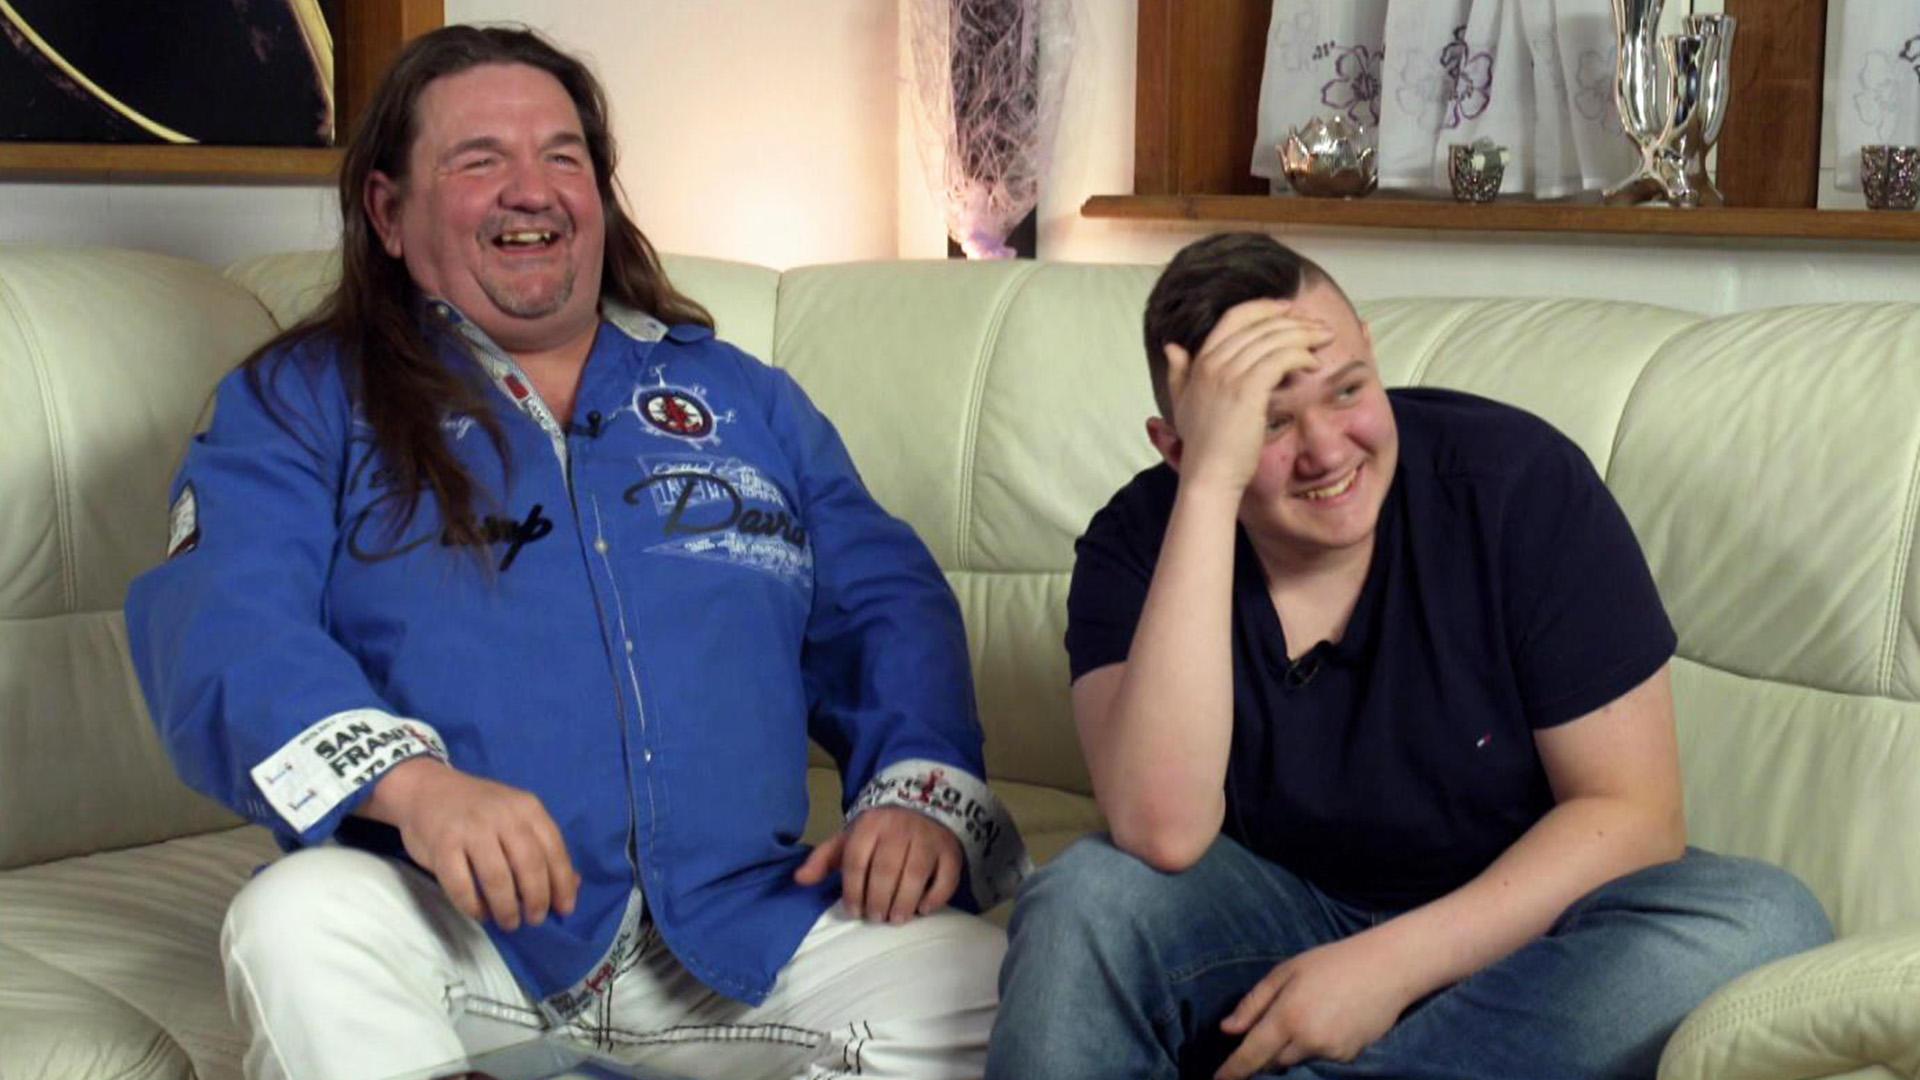 Daniel & Diorellys / Markus & Marlon / Familie Ottemann | Folge 1